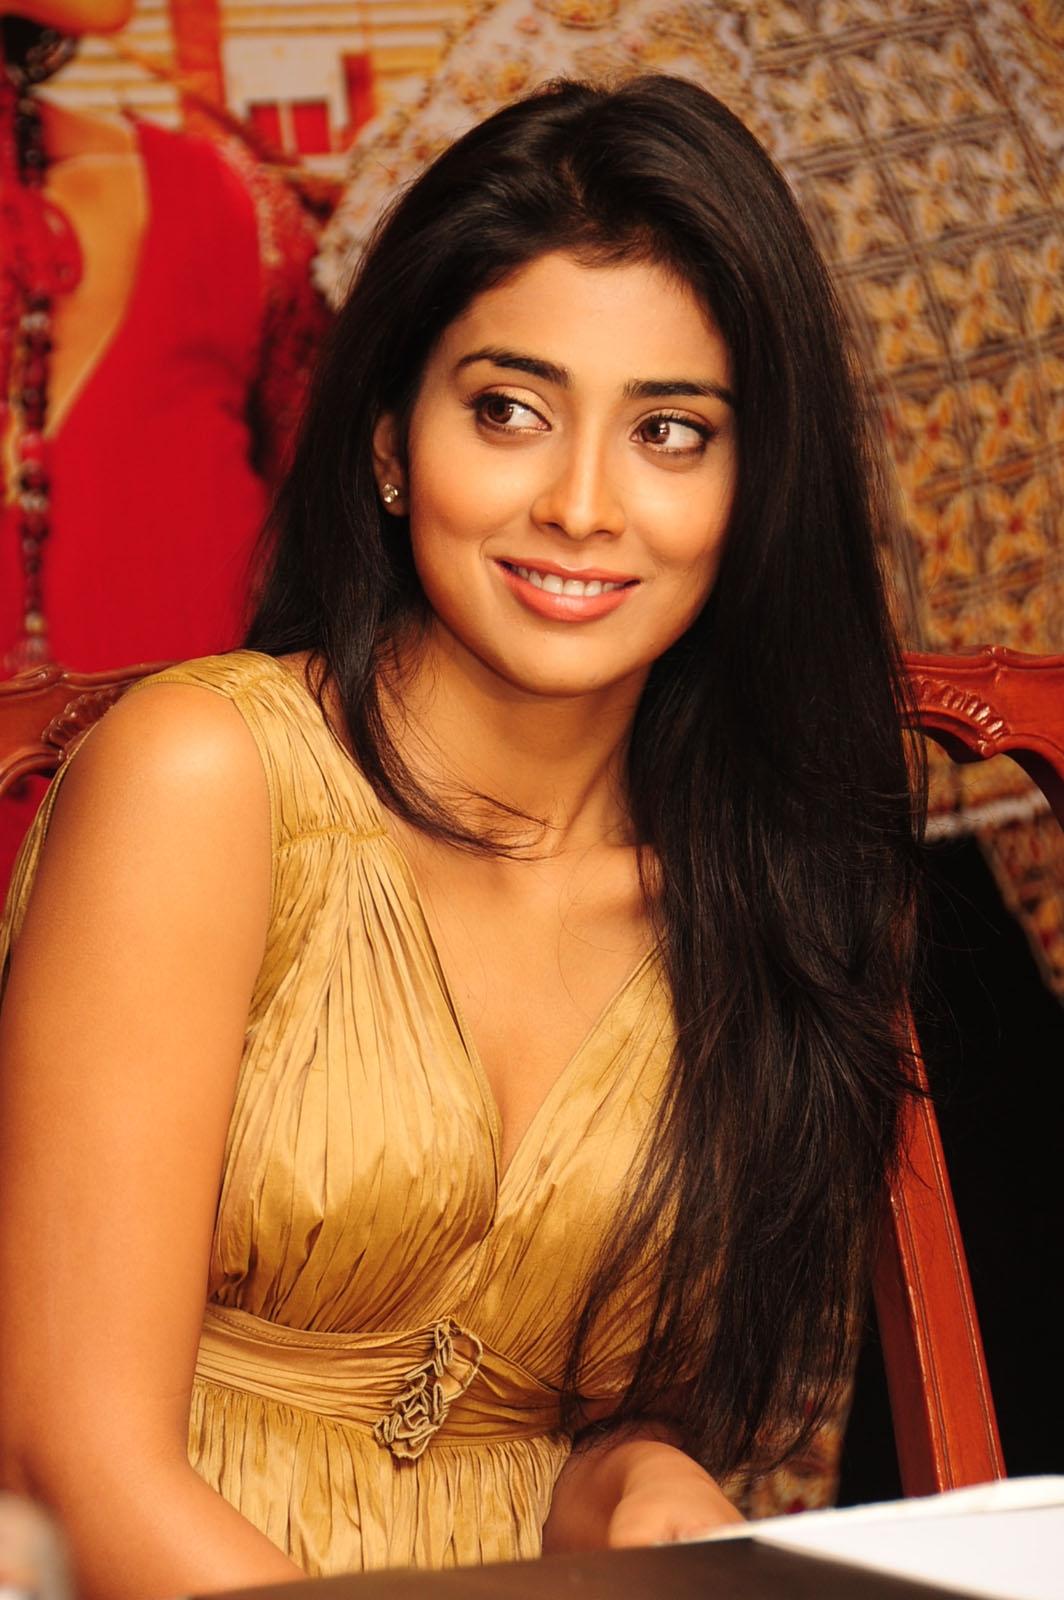 High Quality Bollywood Celebrity Pictures: Shriya Saran